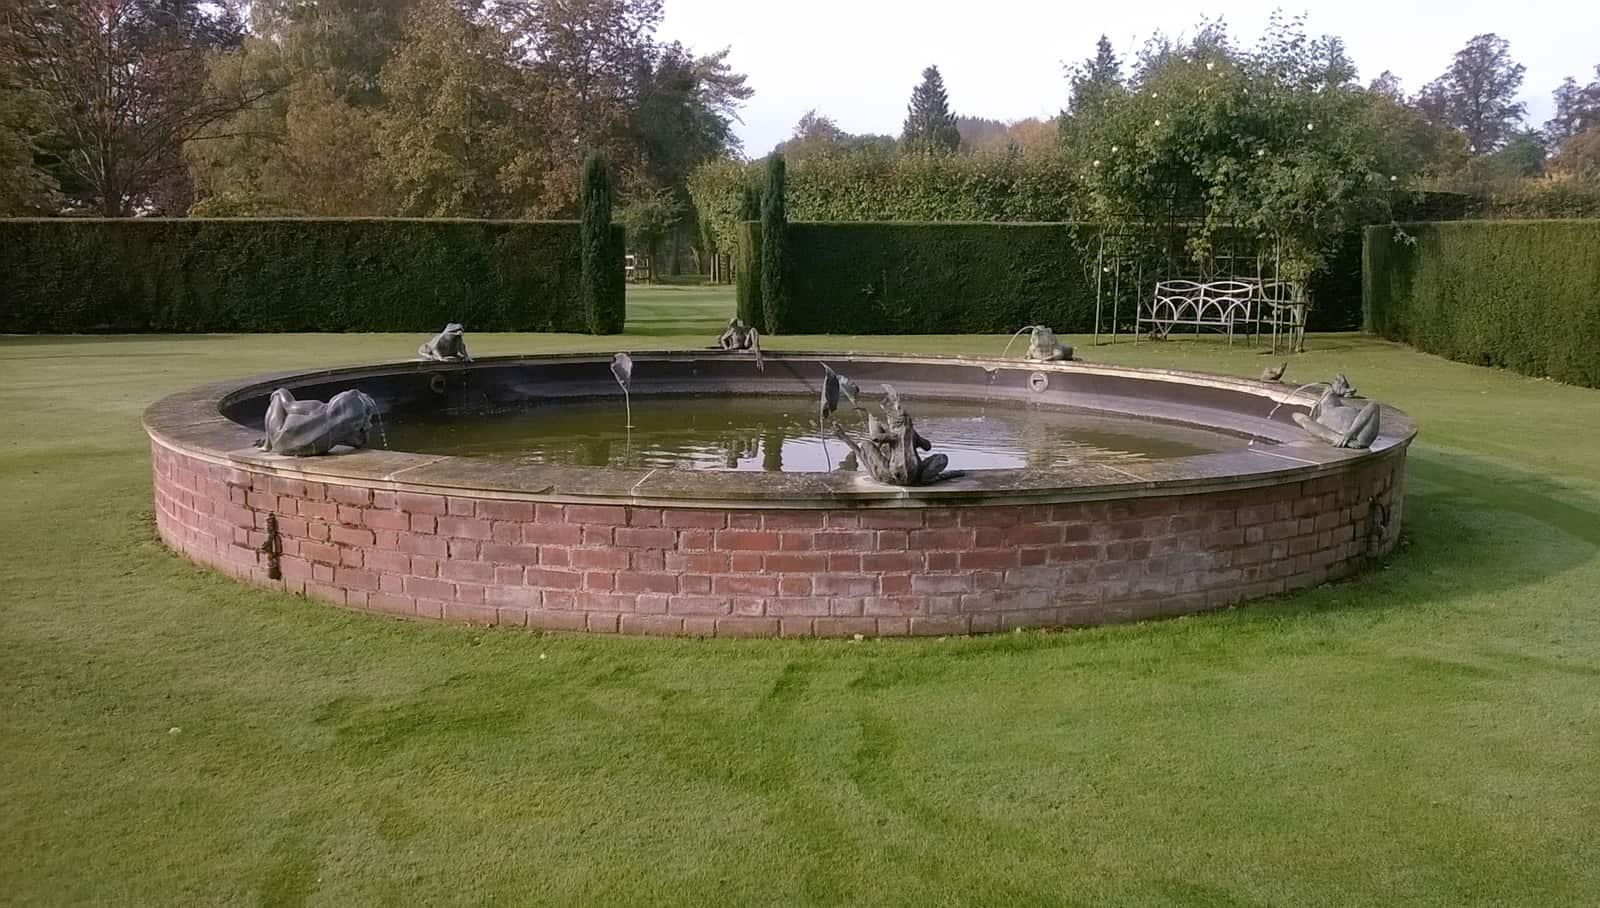 Visit by Spaldwick Gardening Club